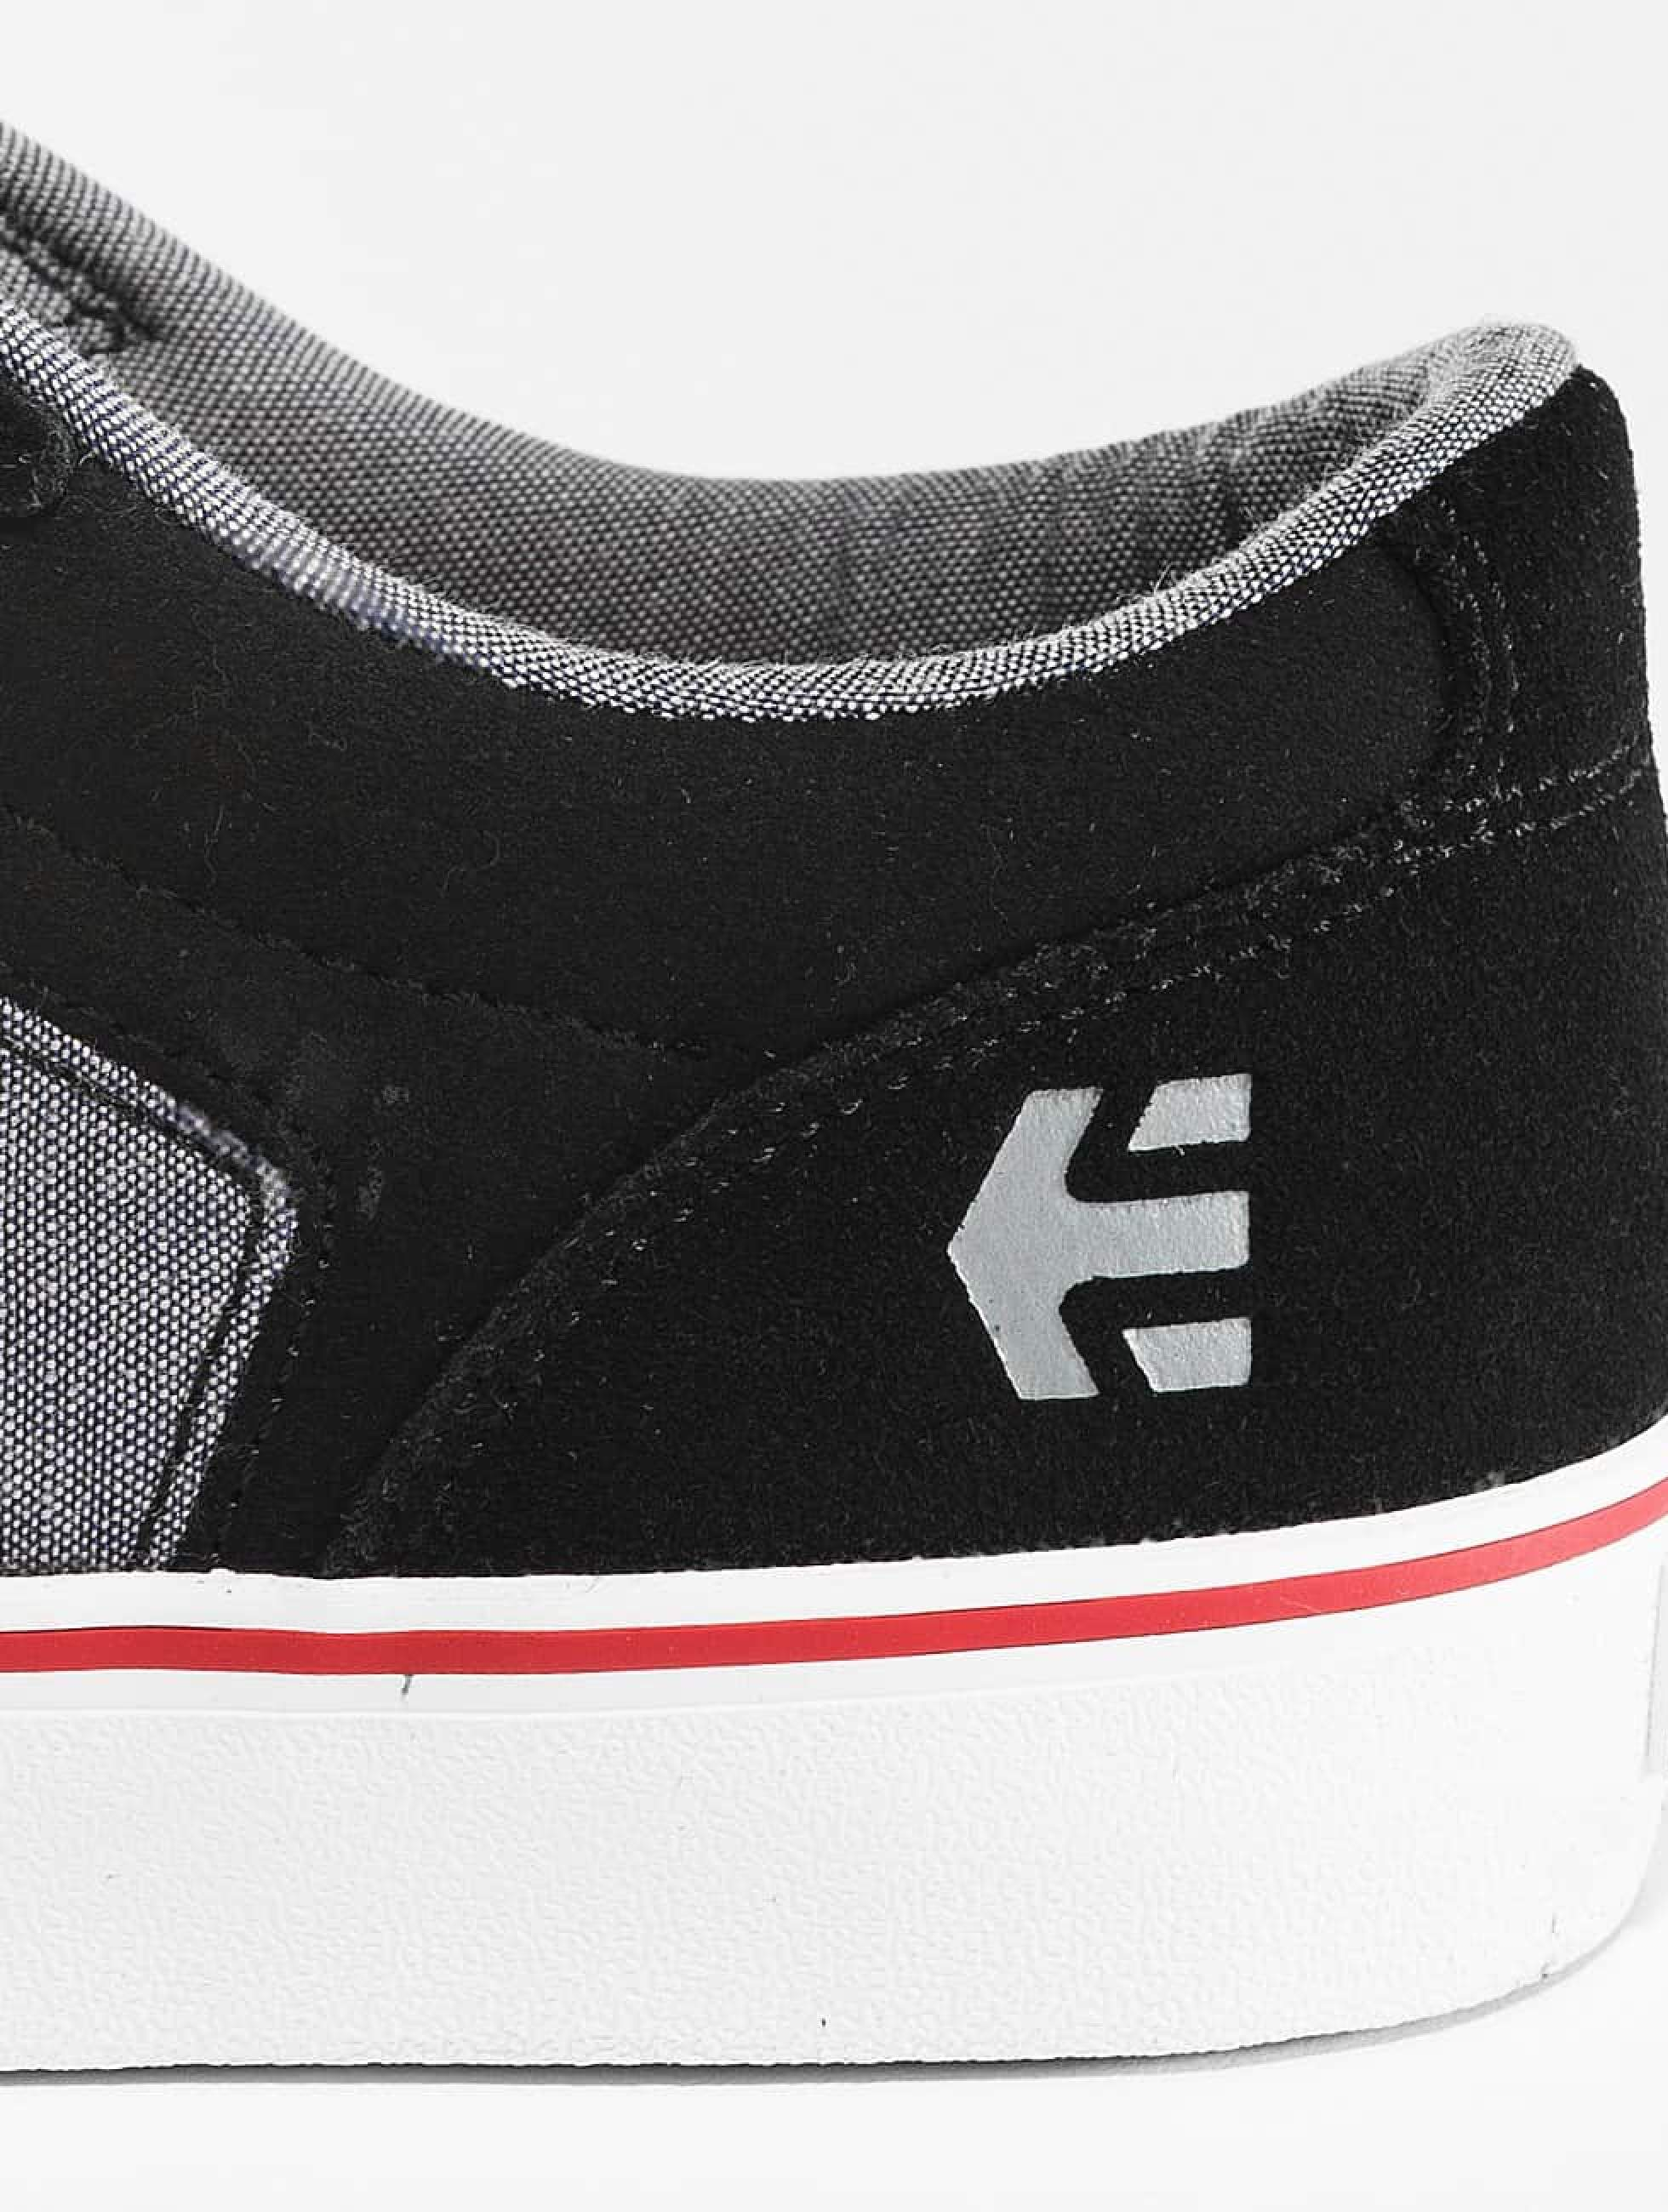 new product 63aa4 383ea ... Nike Mens Free Hypervenom lll FC Flynit Shoe Shoe Shoe Size 13 NEW  898029-001 ...